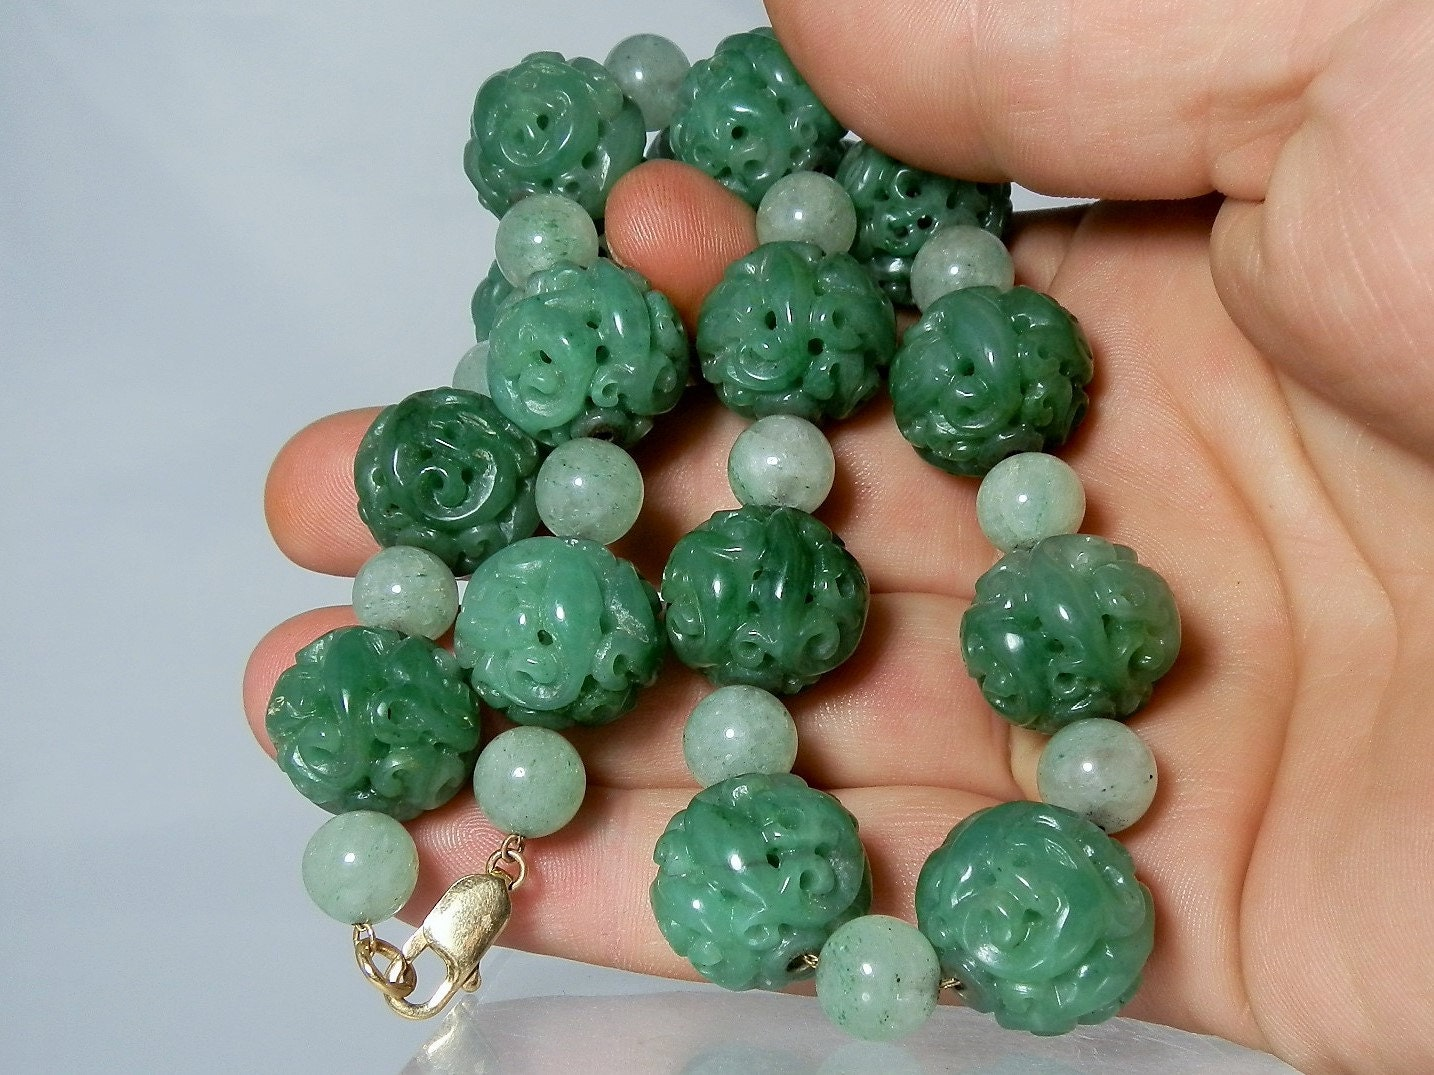 rare carved jadeite jade bead necklace 14k by